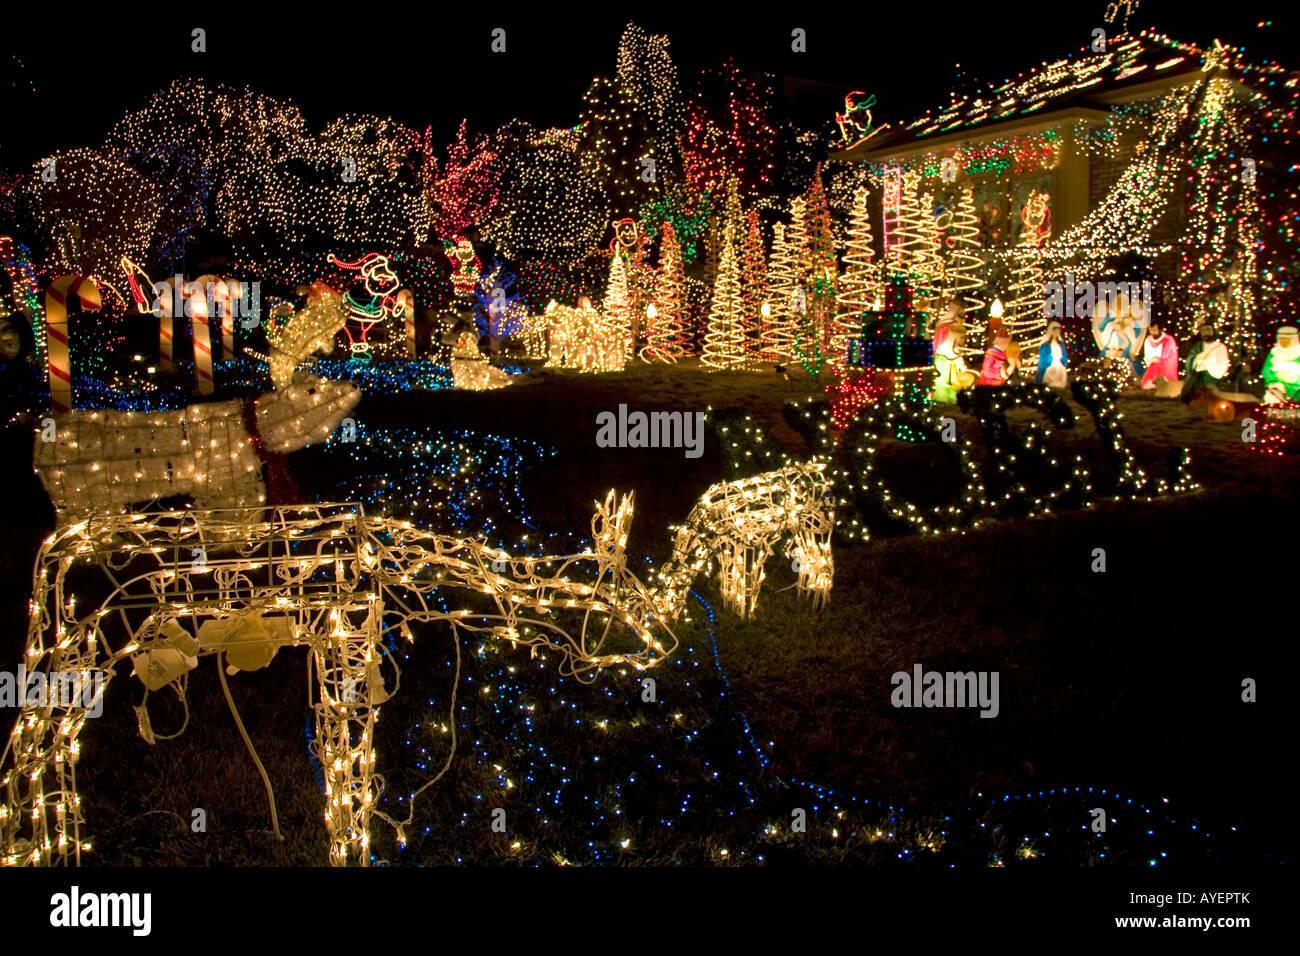 Christmas Lights Boise.Holiday Season Light Display In Boise Idaho Stock Photo